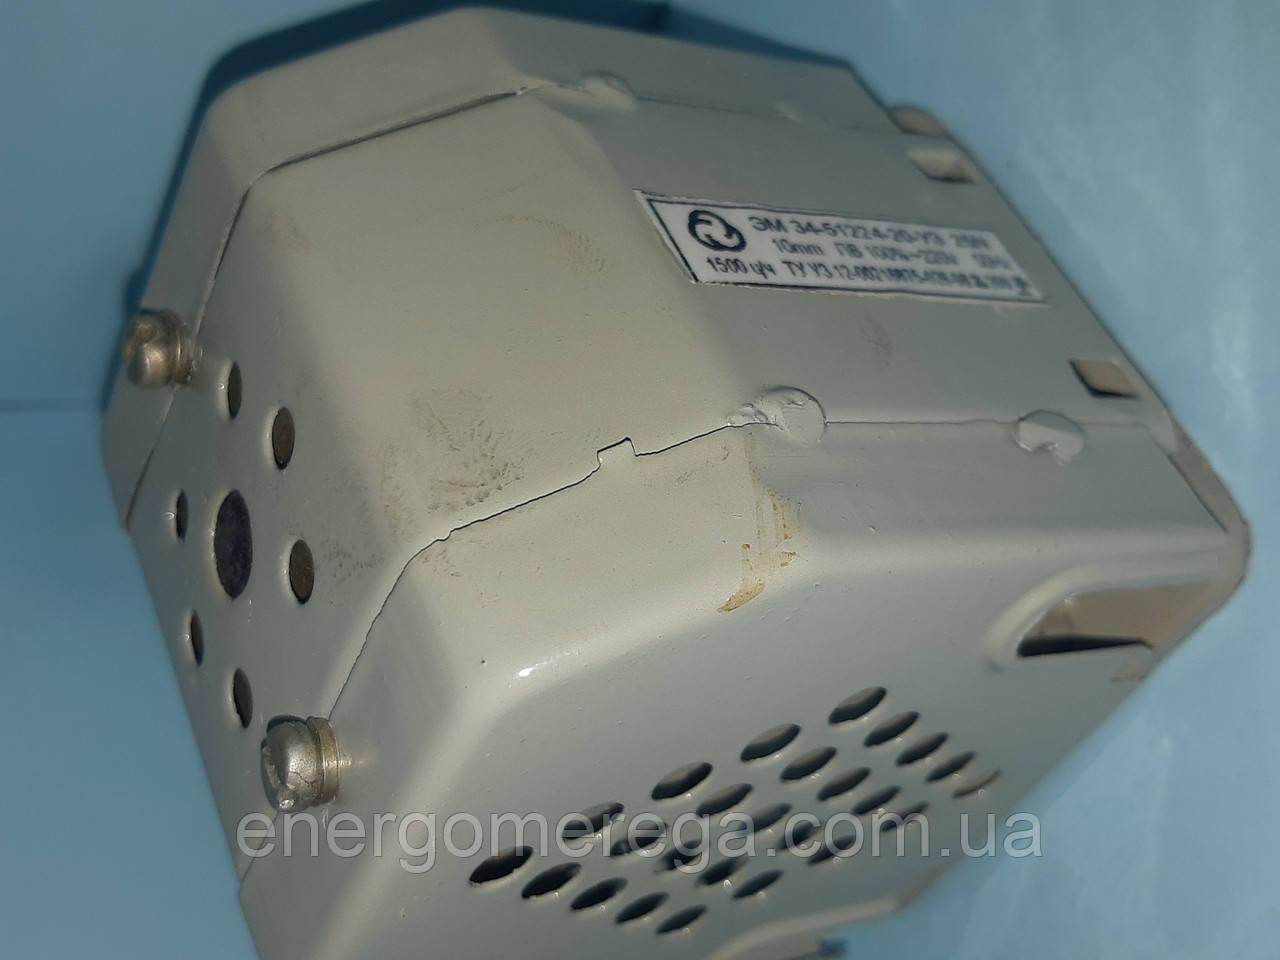 Электромагнит ЭМ 34-51224 127В